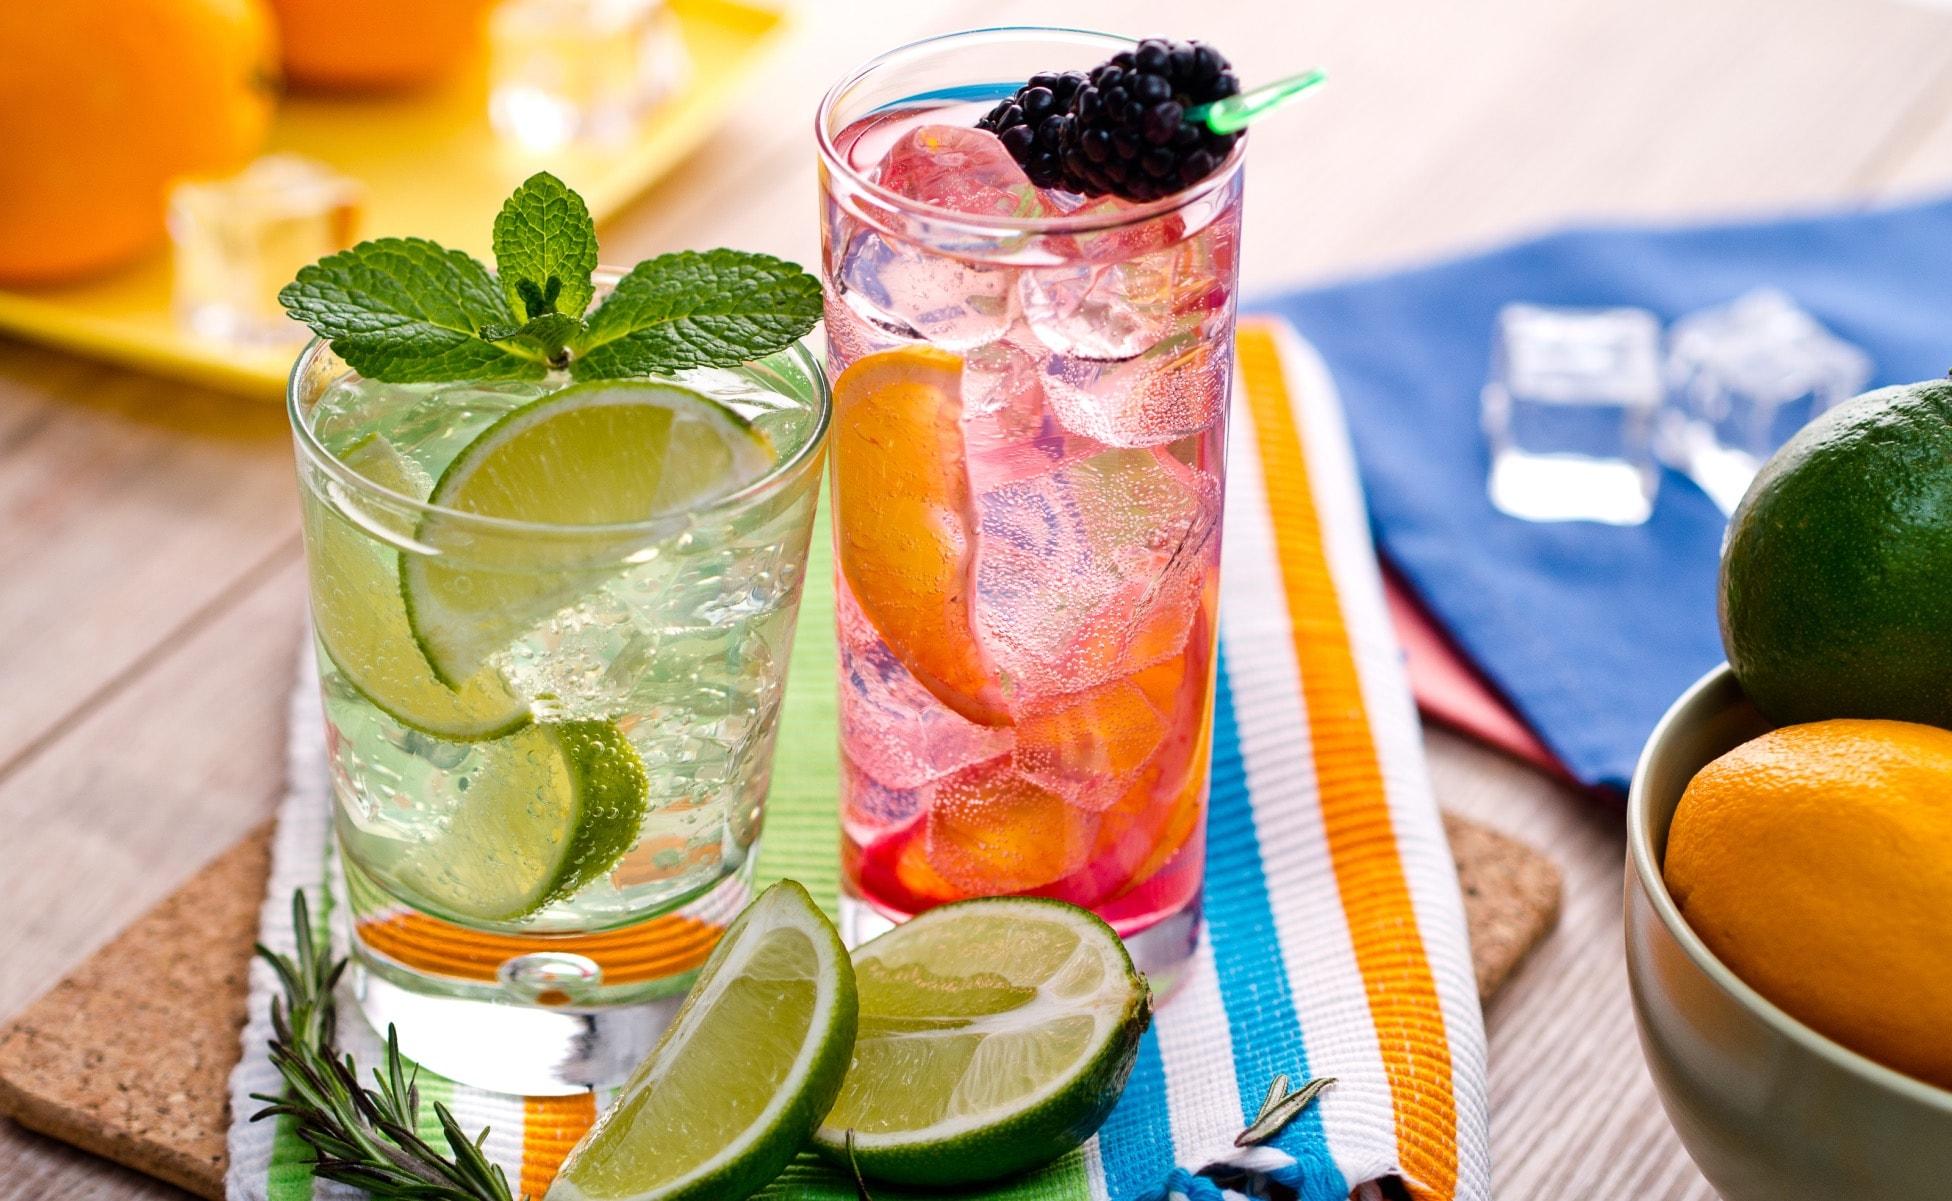 cocteles con tequila populares